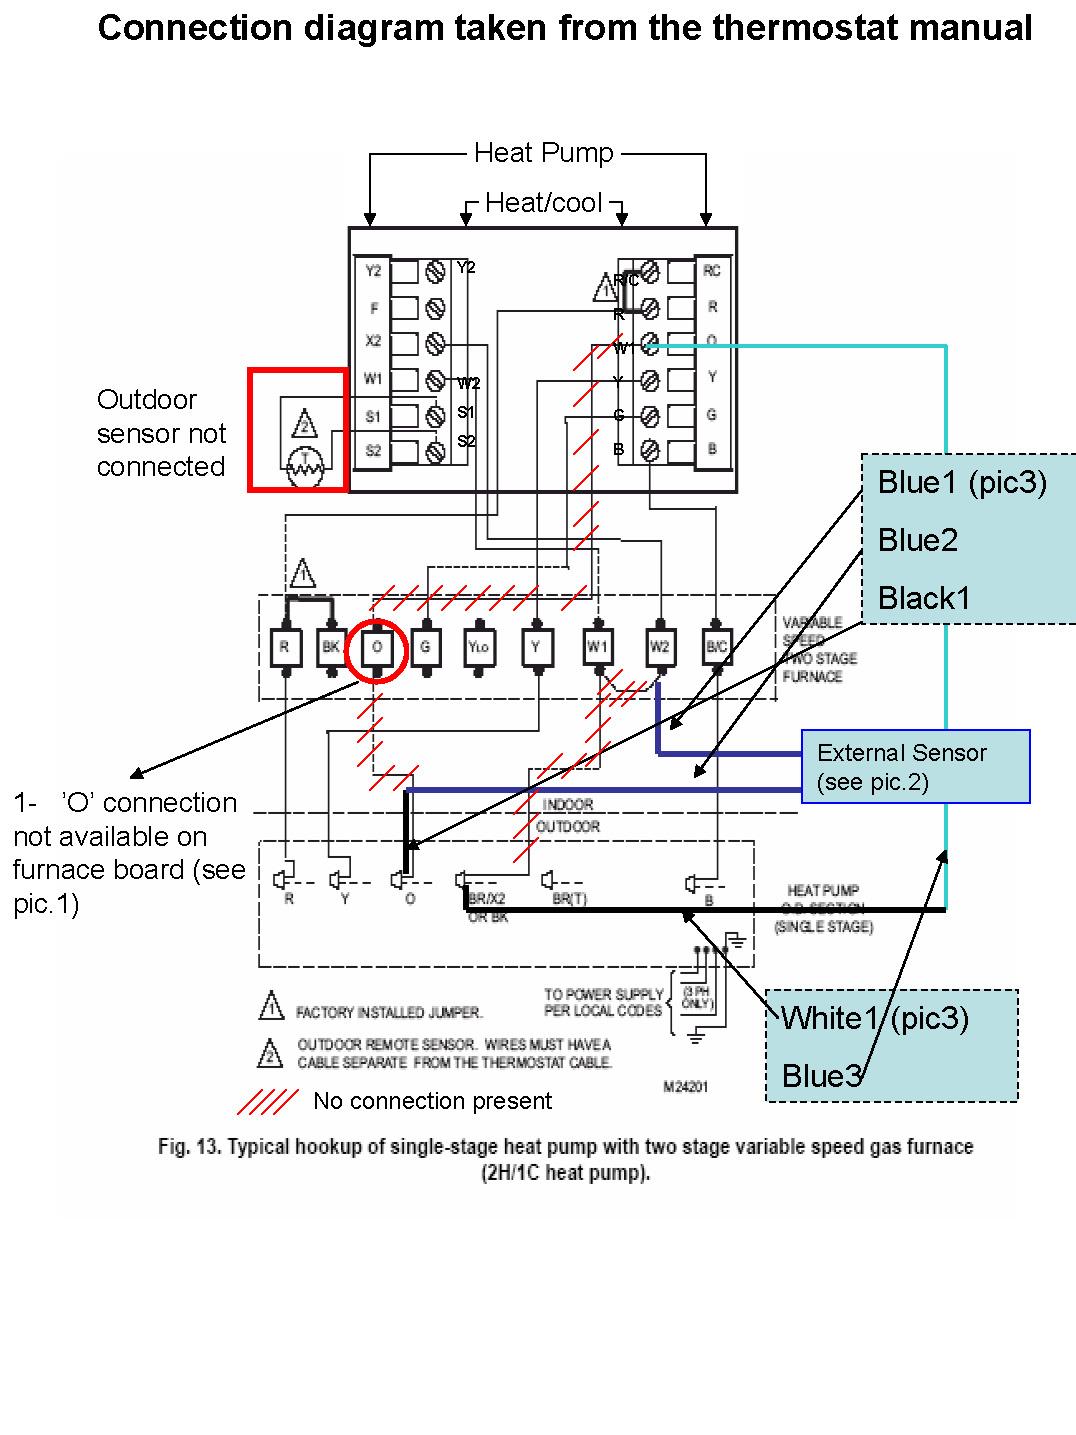 dual fuel furnace wiring diagram ca 8747  wiring diagram on nest dual fuel heat pump thermostat  wiring diagram on nest dual fuel heat